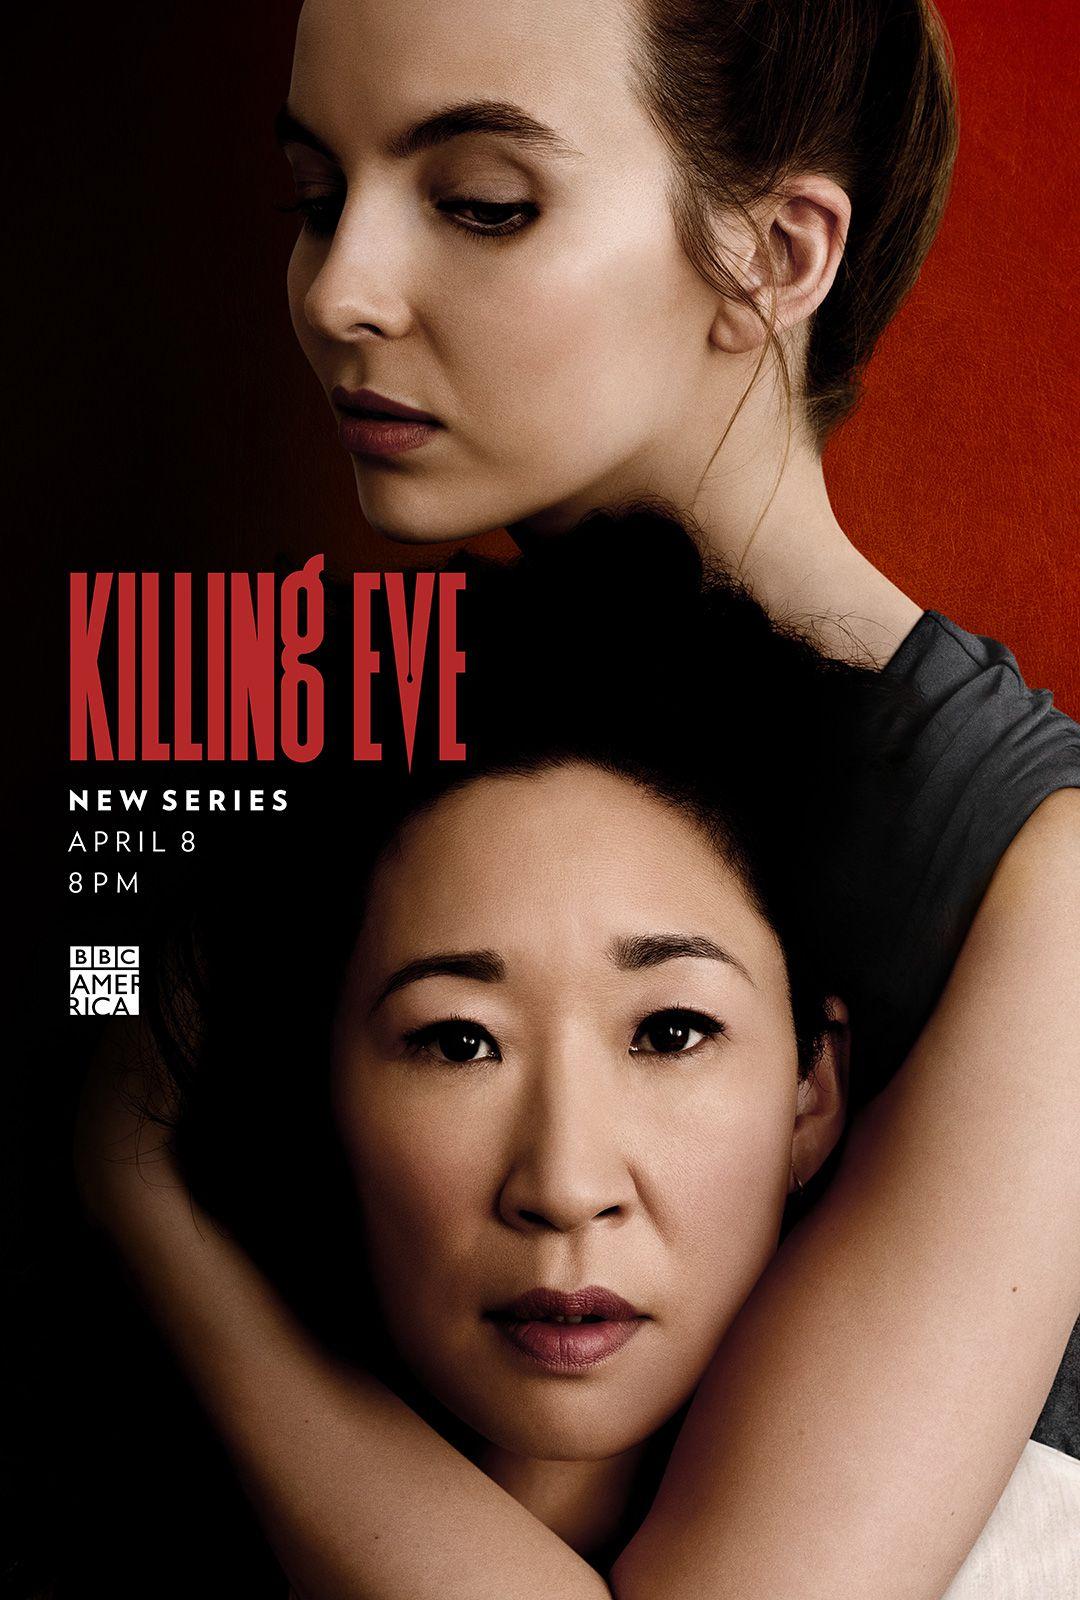 new girl season 1 episode 4 online free